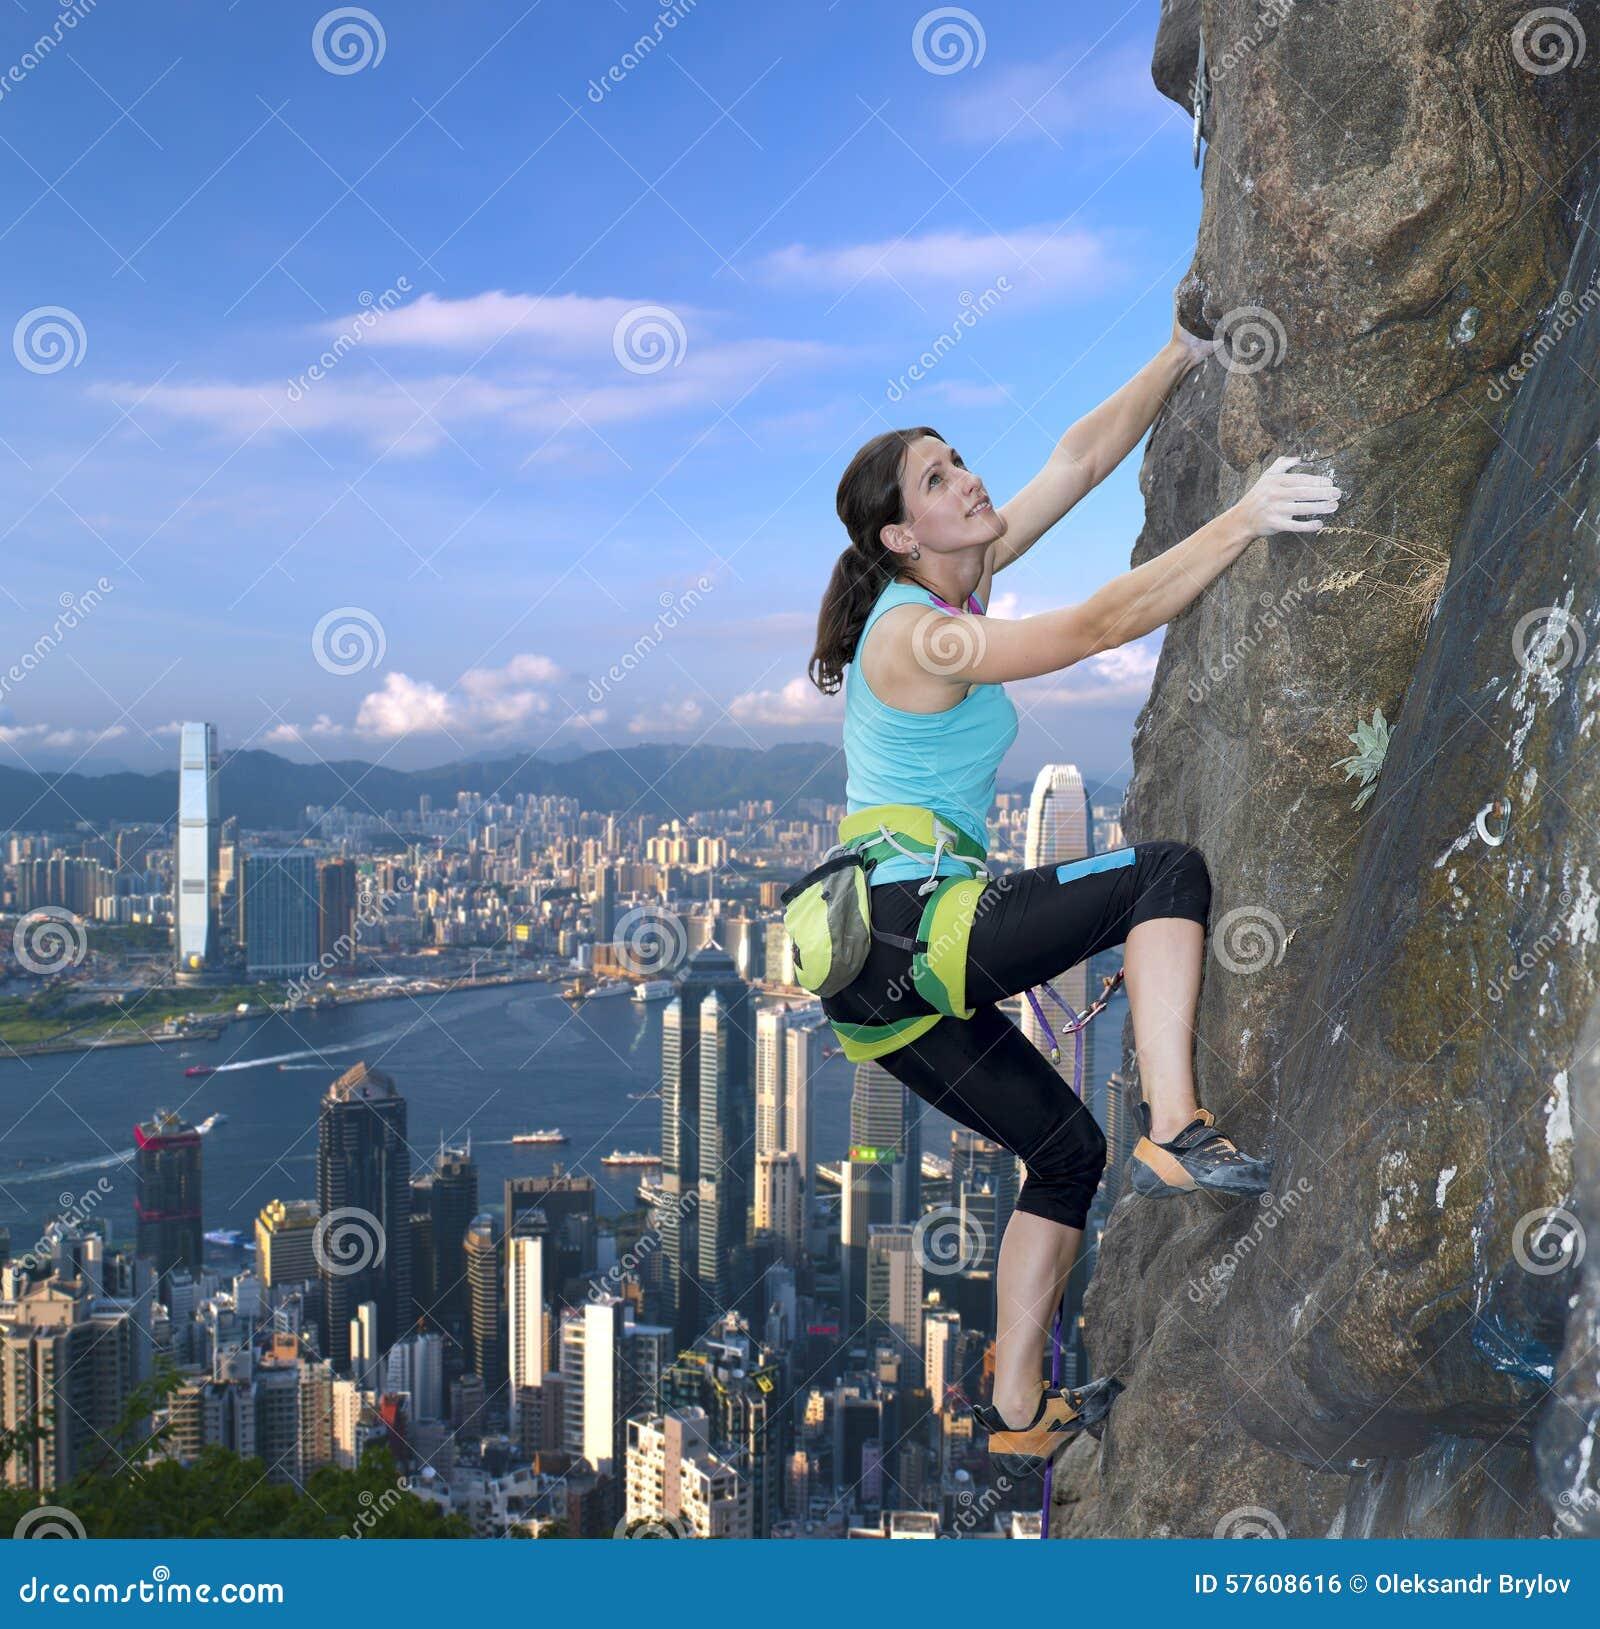 female extreme climber and - photo #10